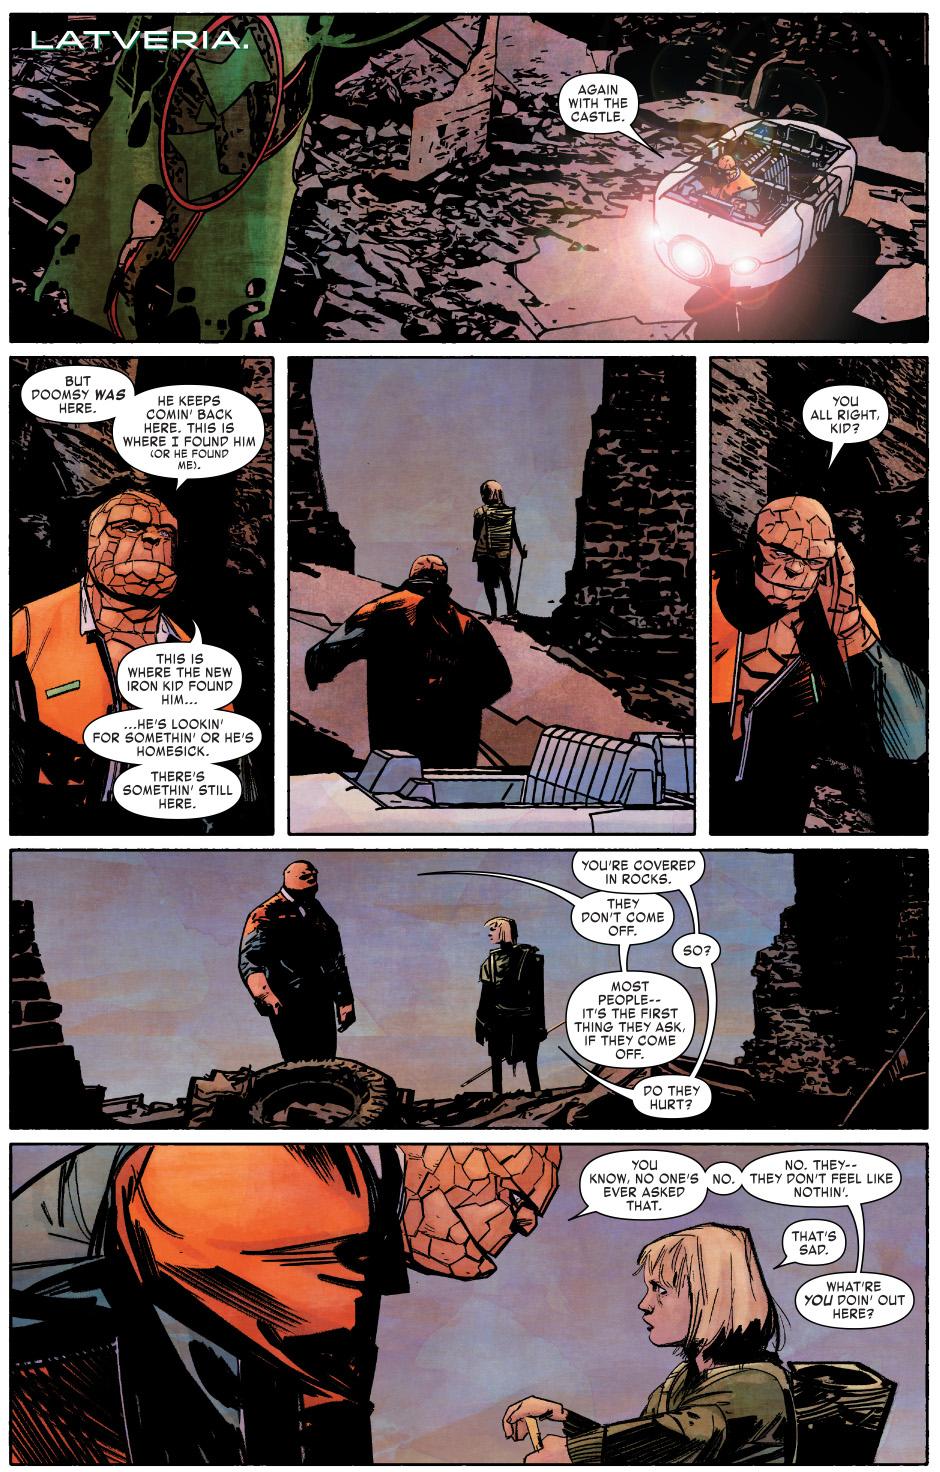 Latveria Loves Doctor Doom (Infamous Iron Man)